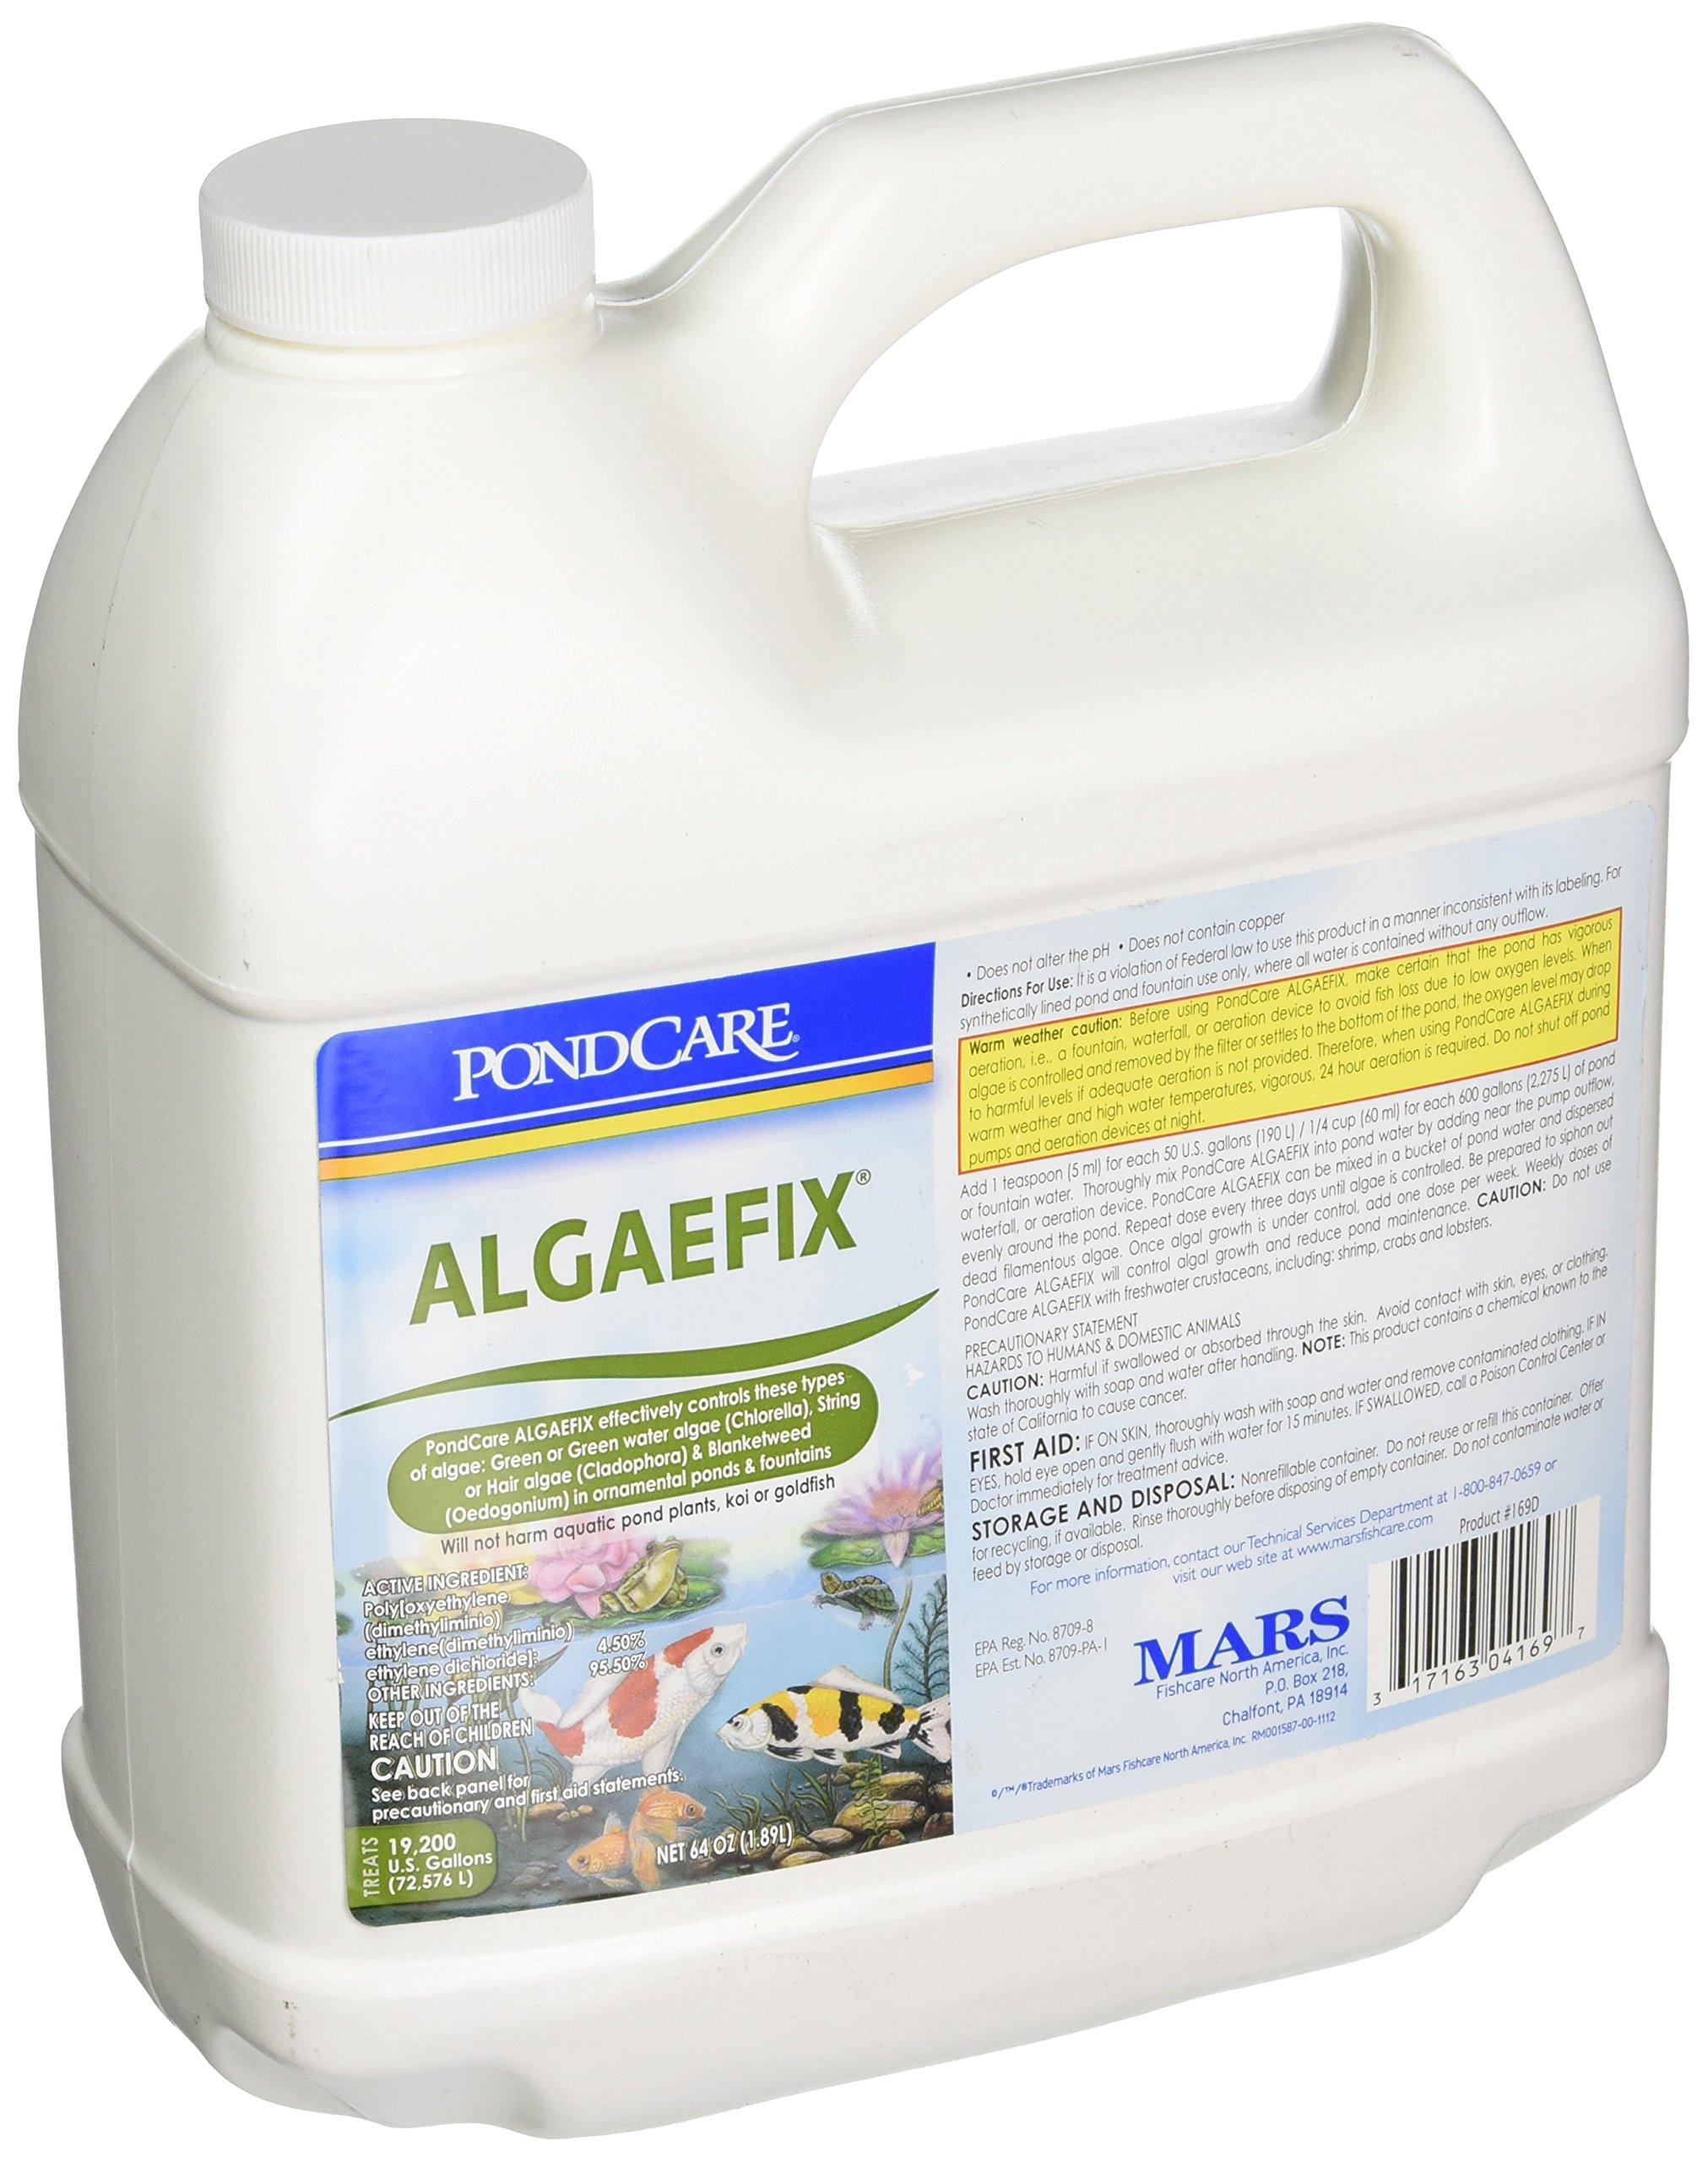 API PondCare AlgaeFix, 64 Ounce Bottle